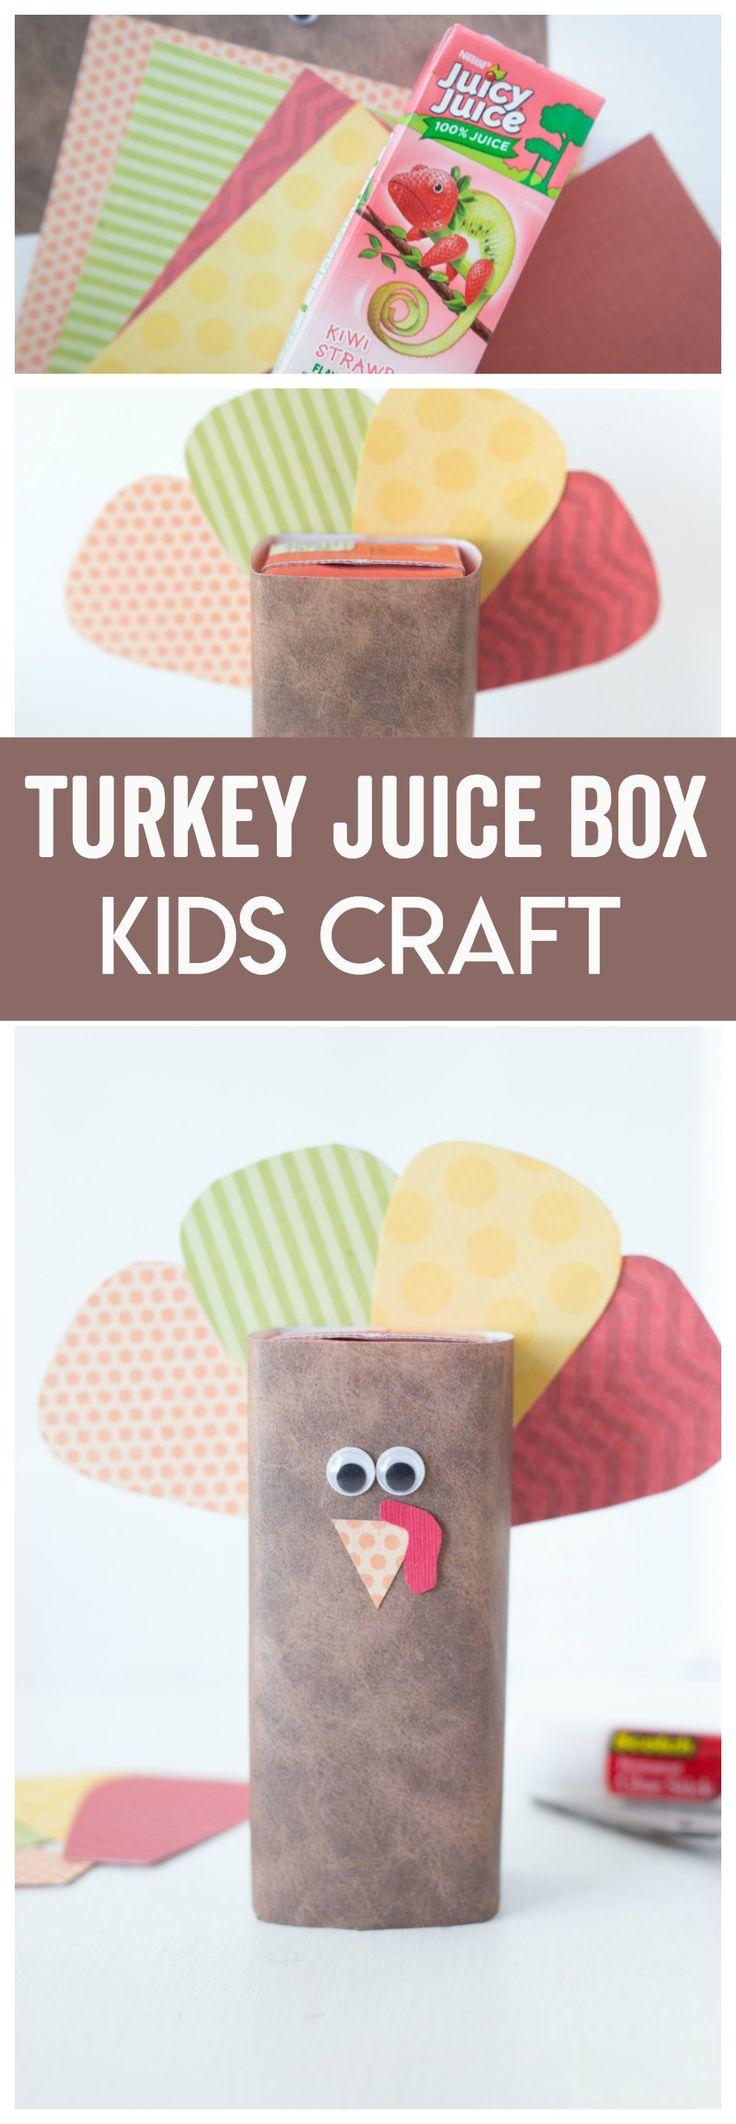 Turkey Juice Box Kids Craft Made